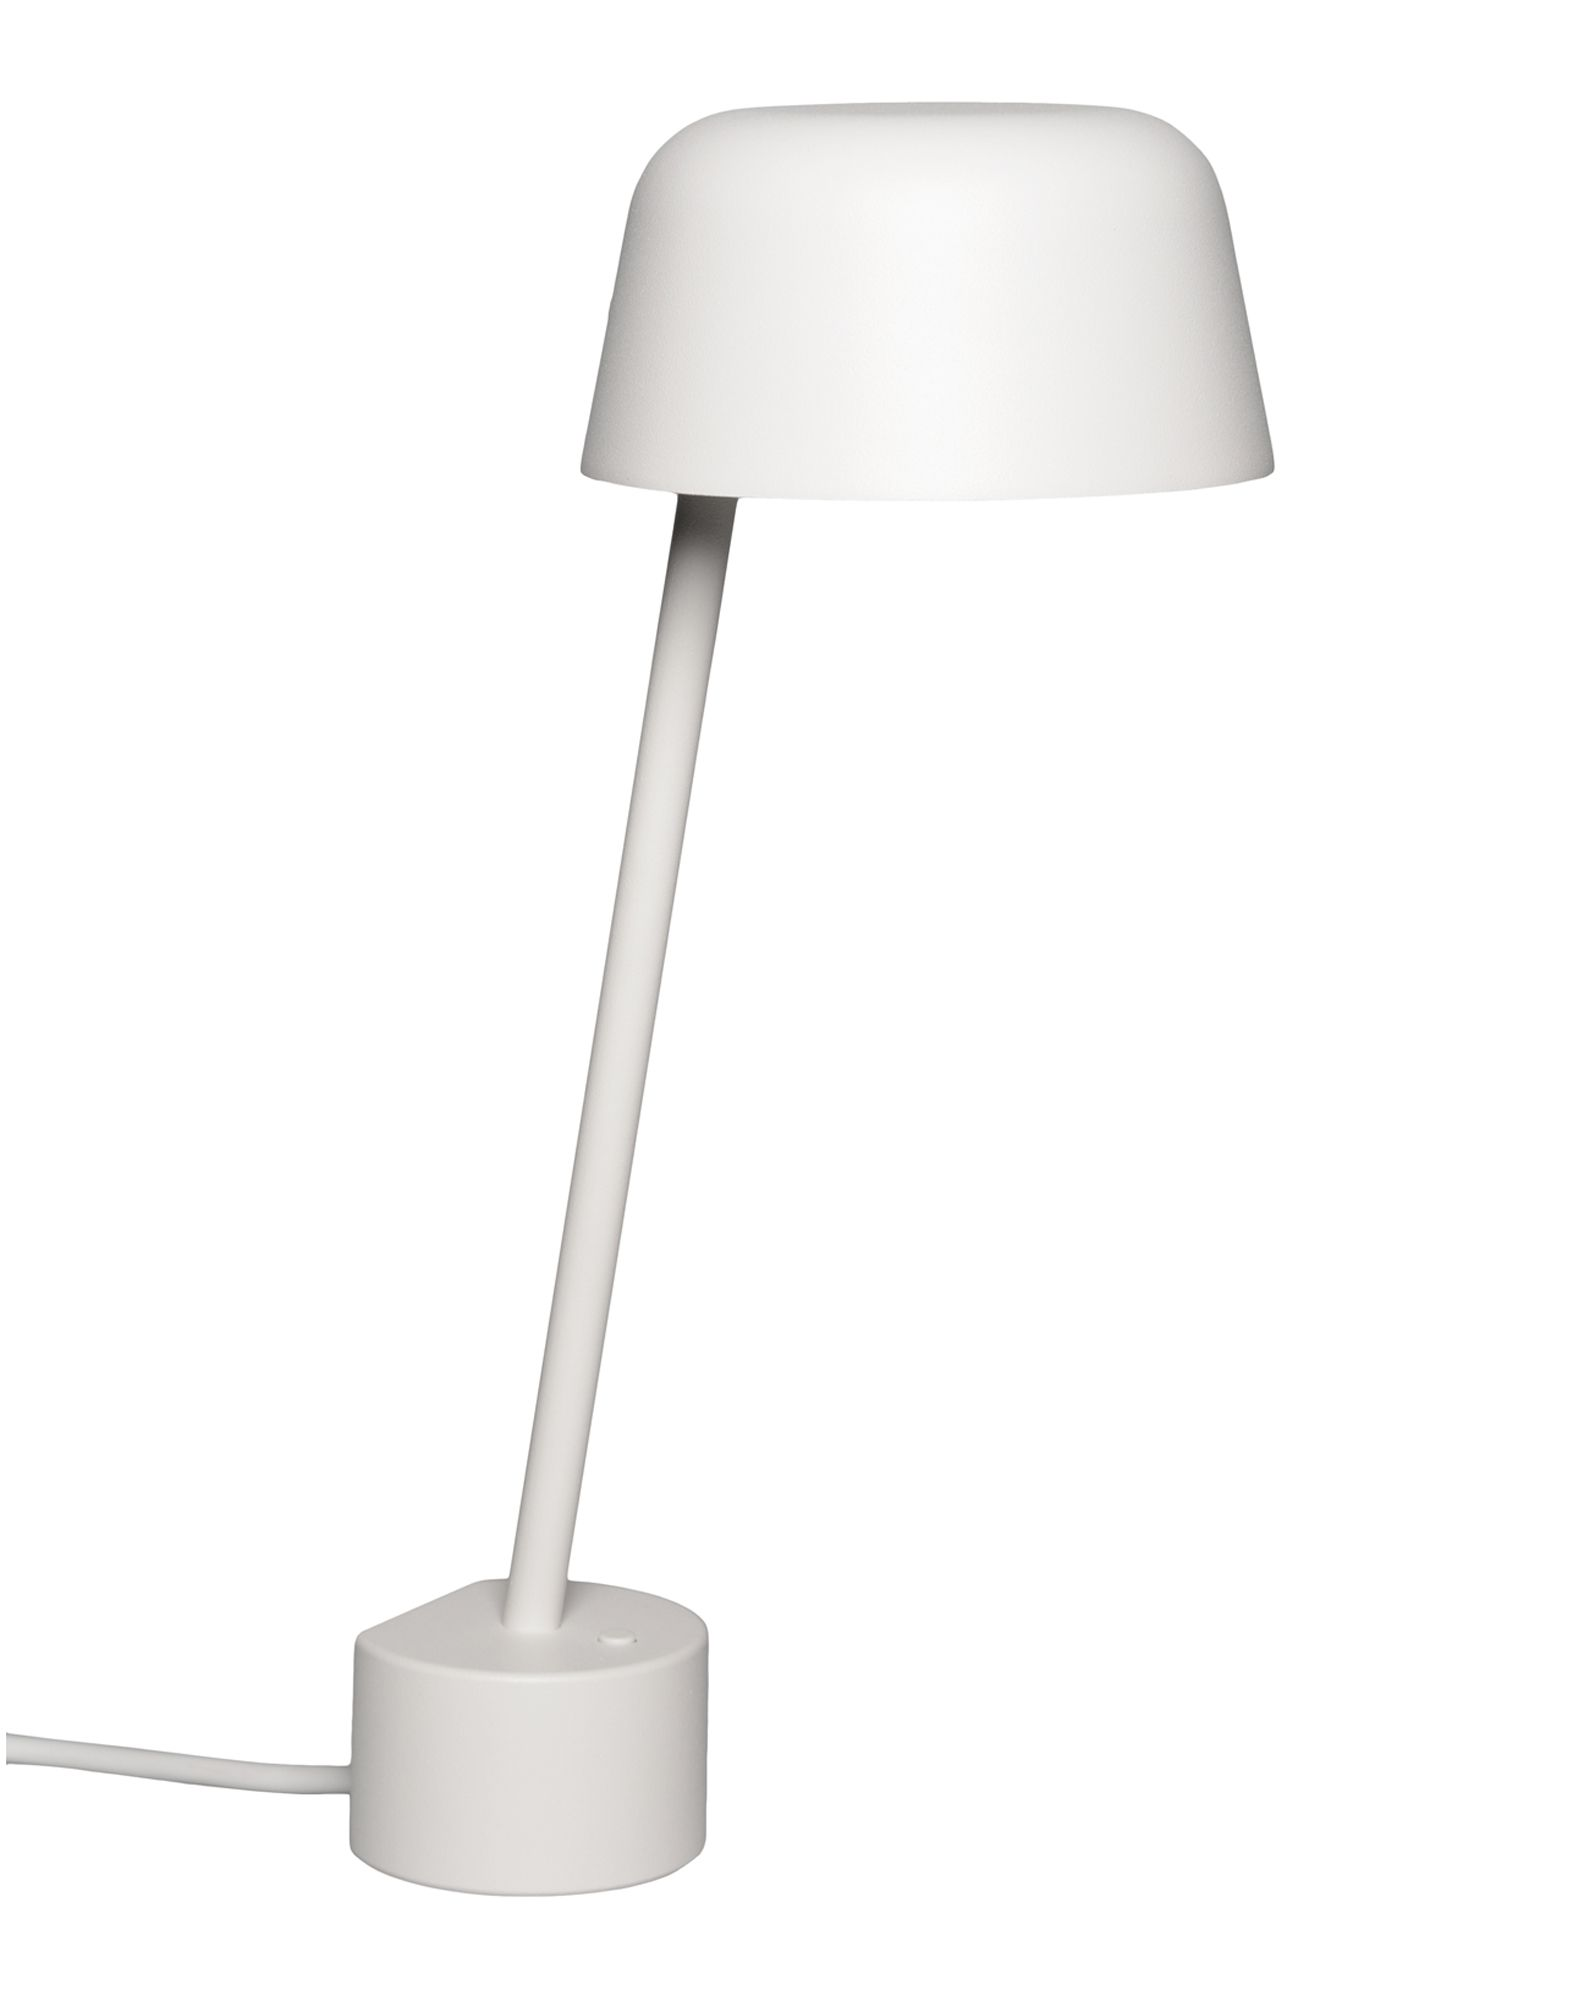 MUUTO Настольная лампа muuto предмет сервировки стола